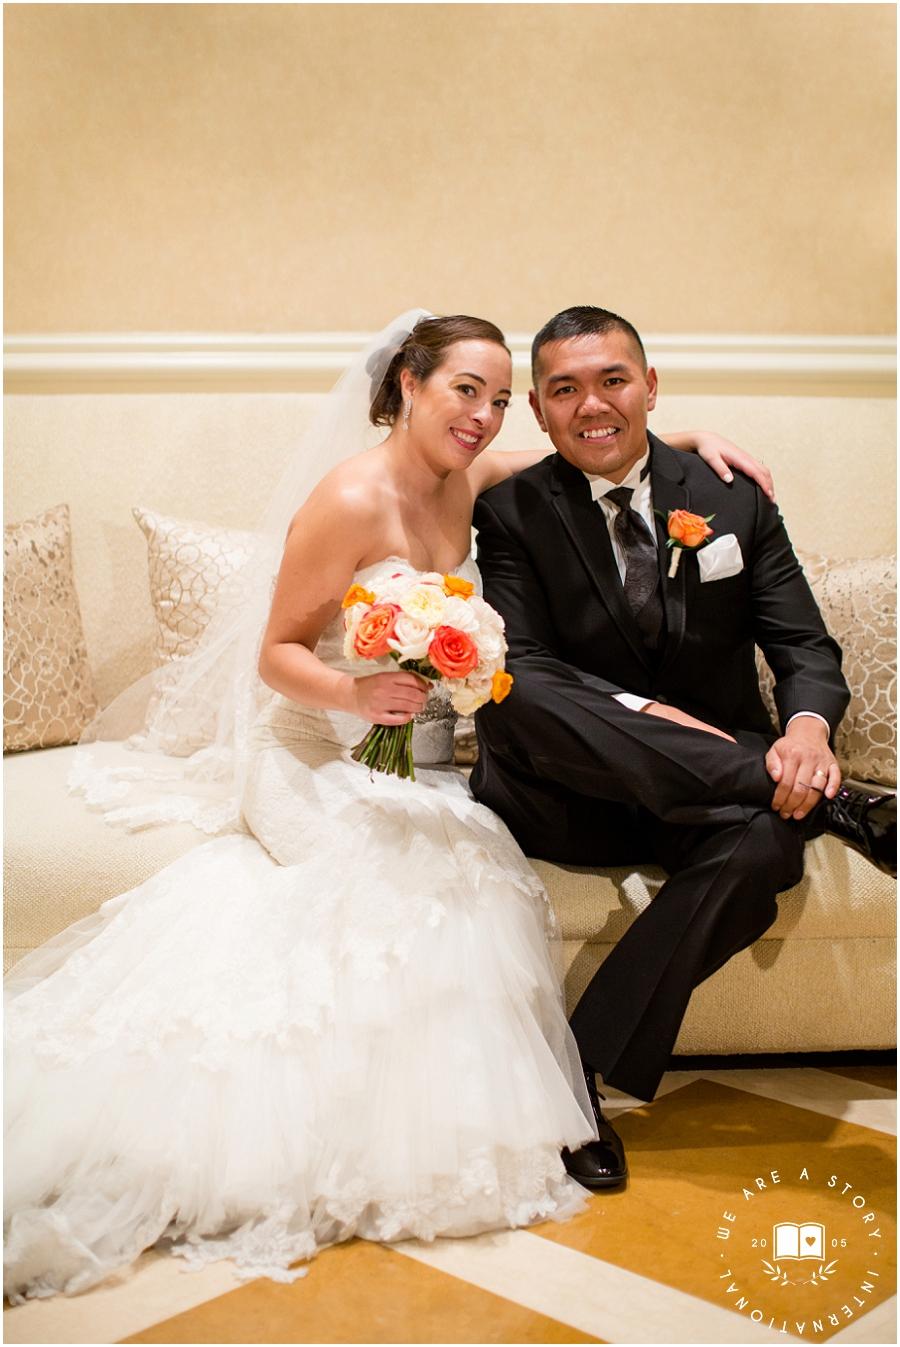 Four Seasons wedding photographer Las Vegas _ We Are A Story wedding photographer_2499.jpg